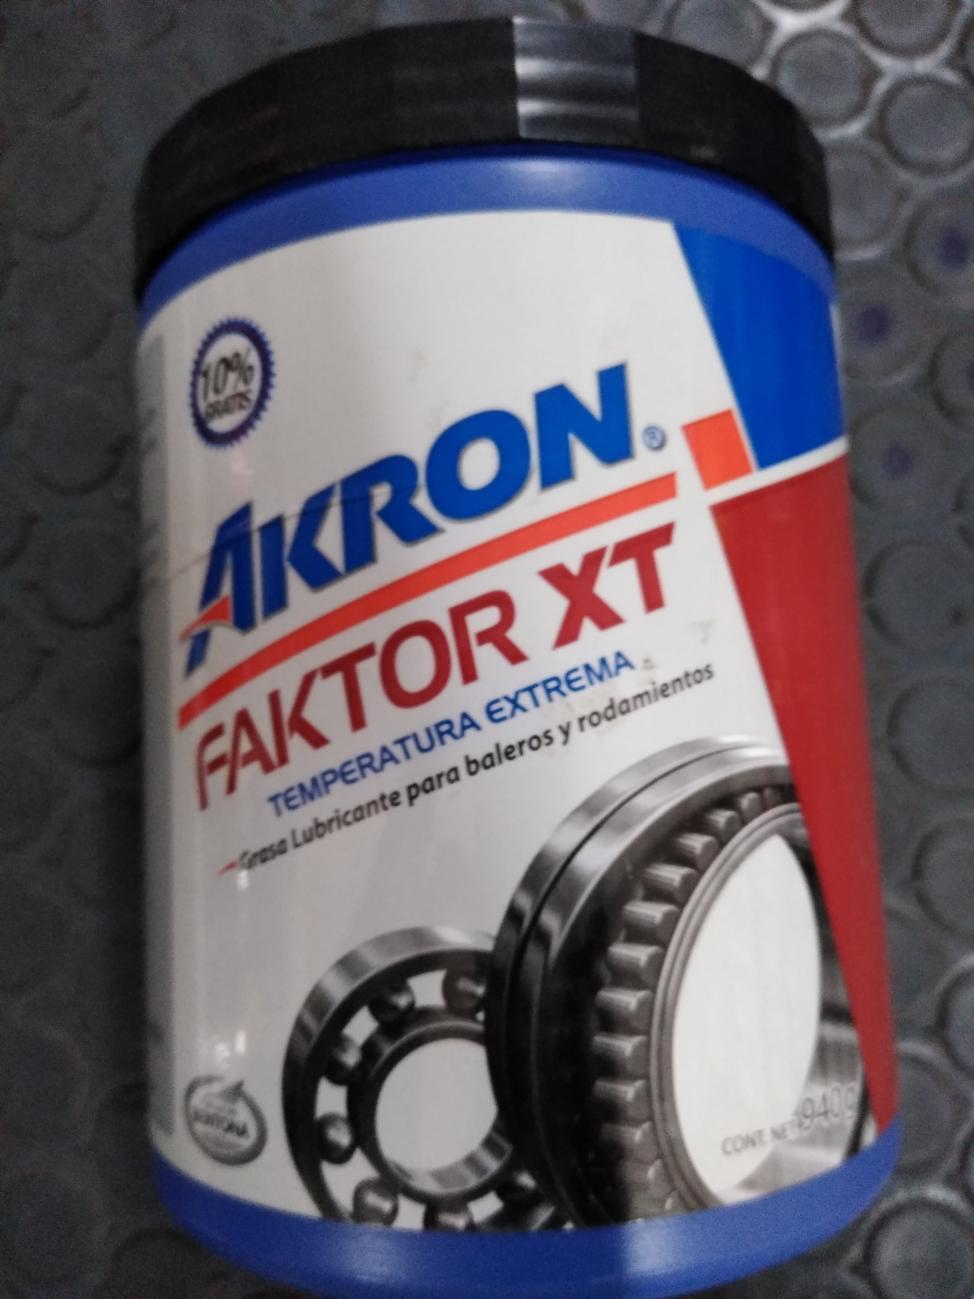 785639669742 GRASA AKRON FAKTOR XT TEMPERATURA EXTREMA 940G